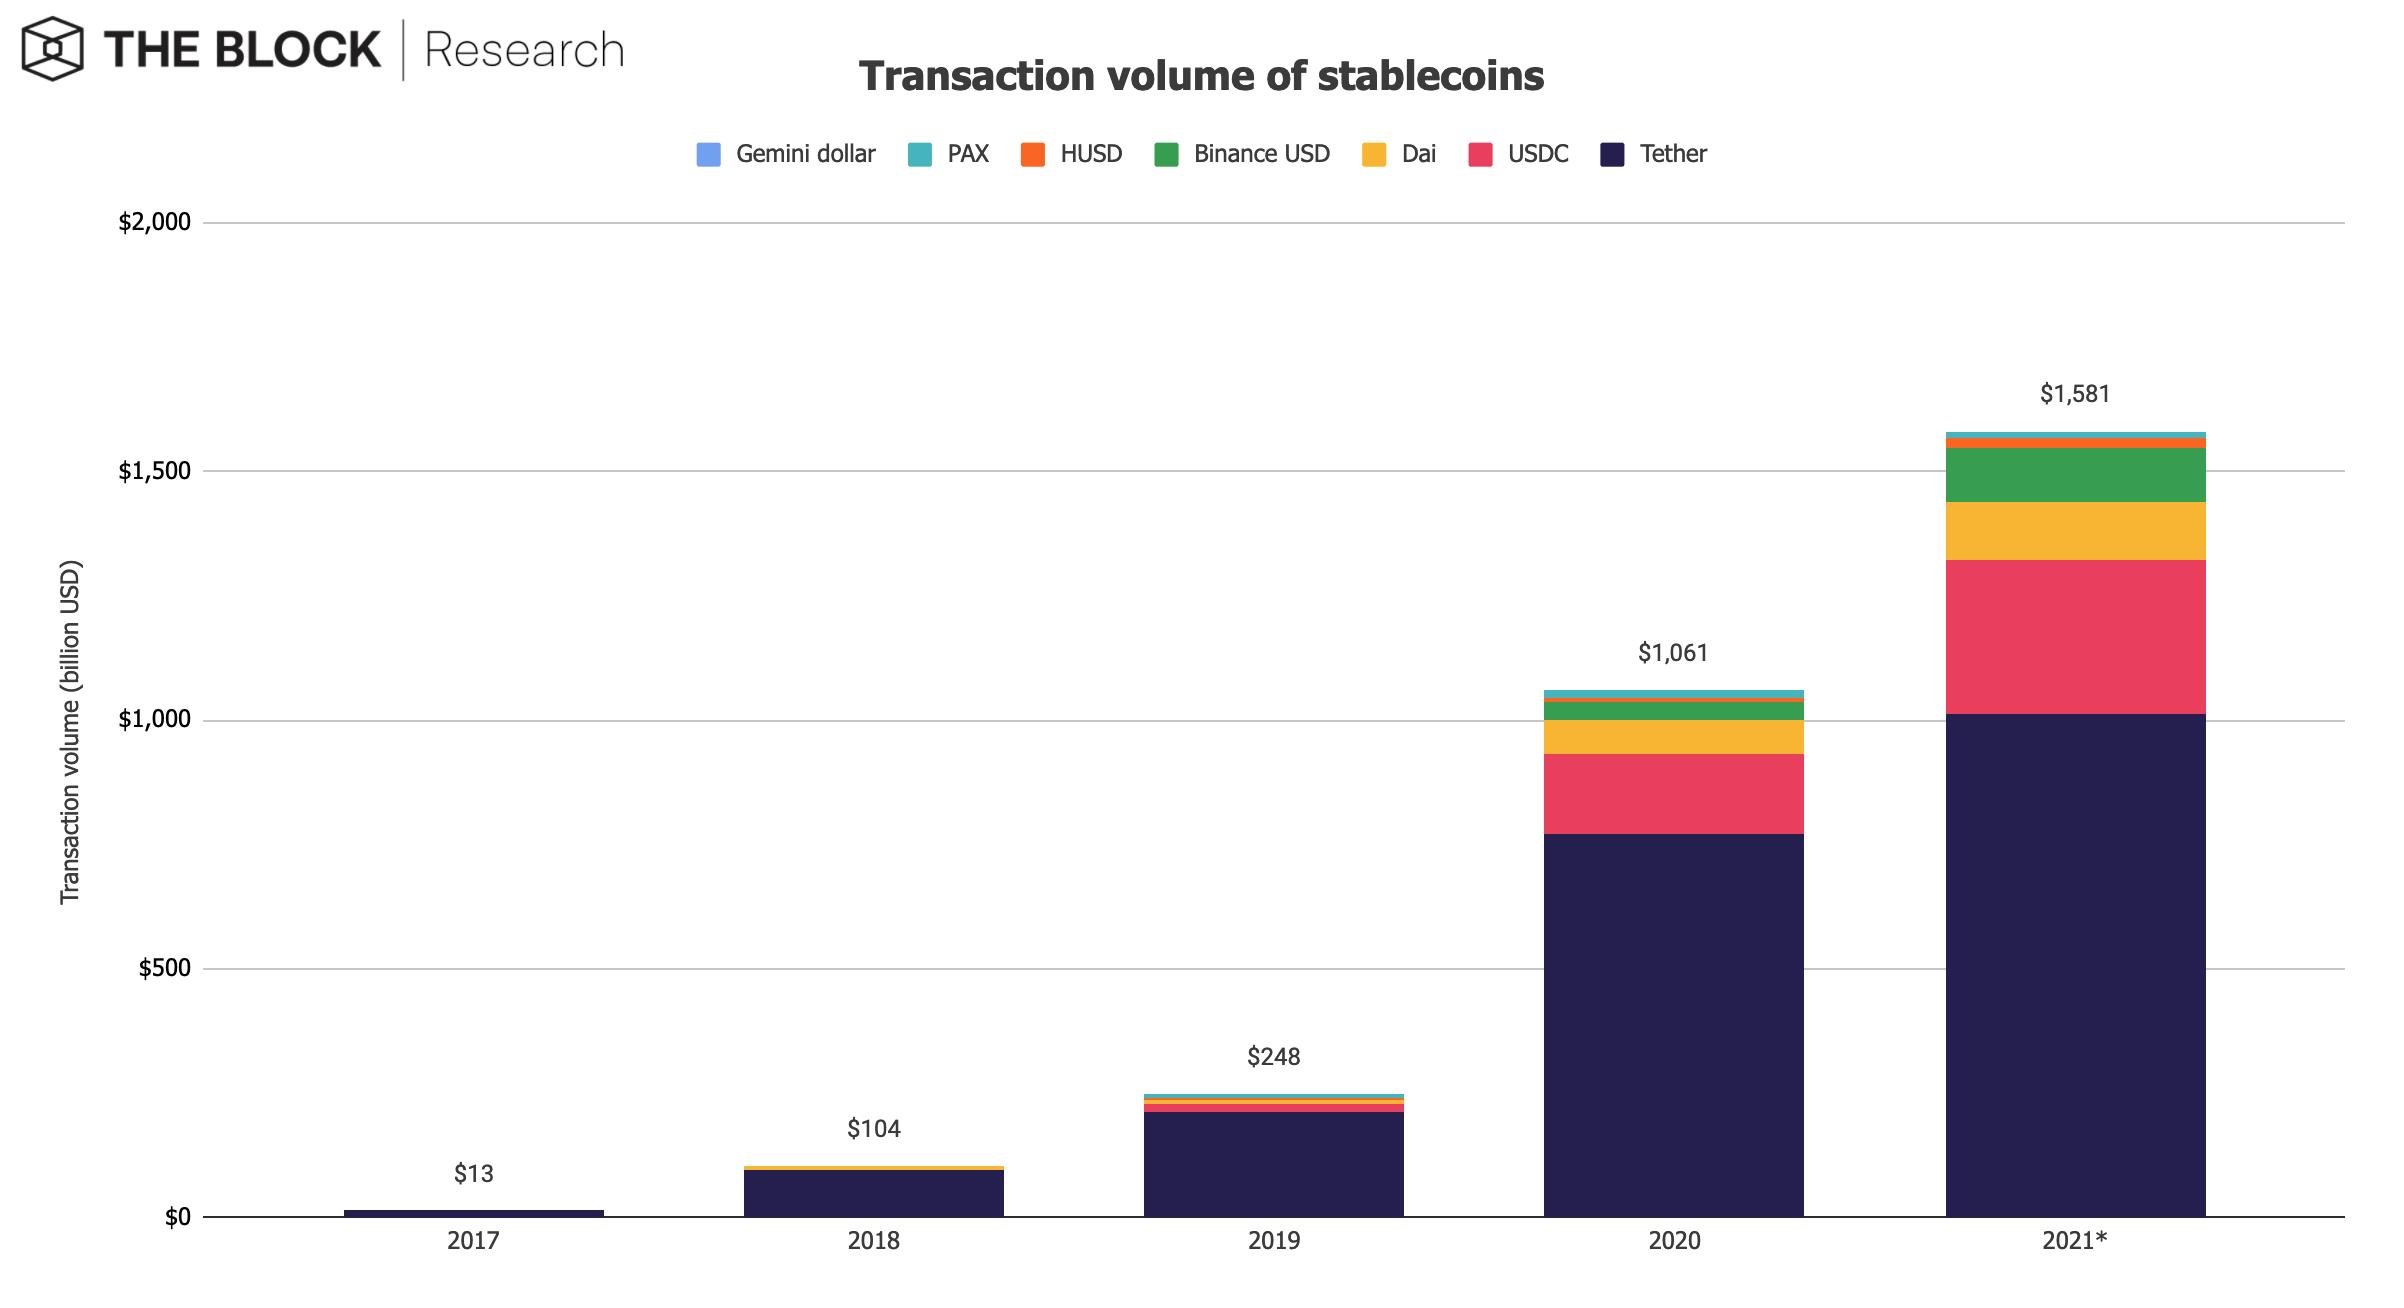 khối lượng giao dịch stablecoin